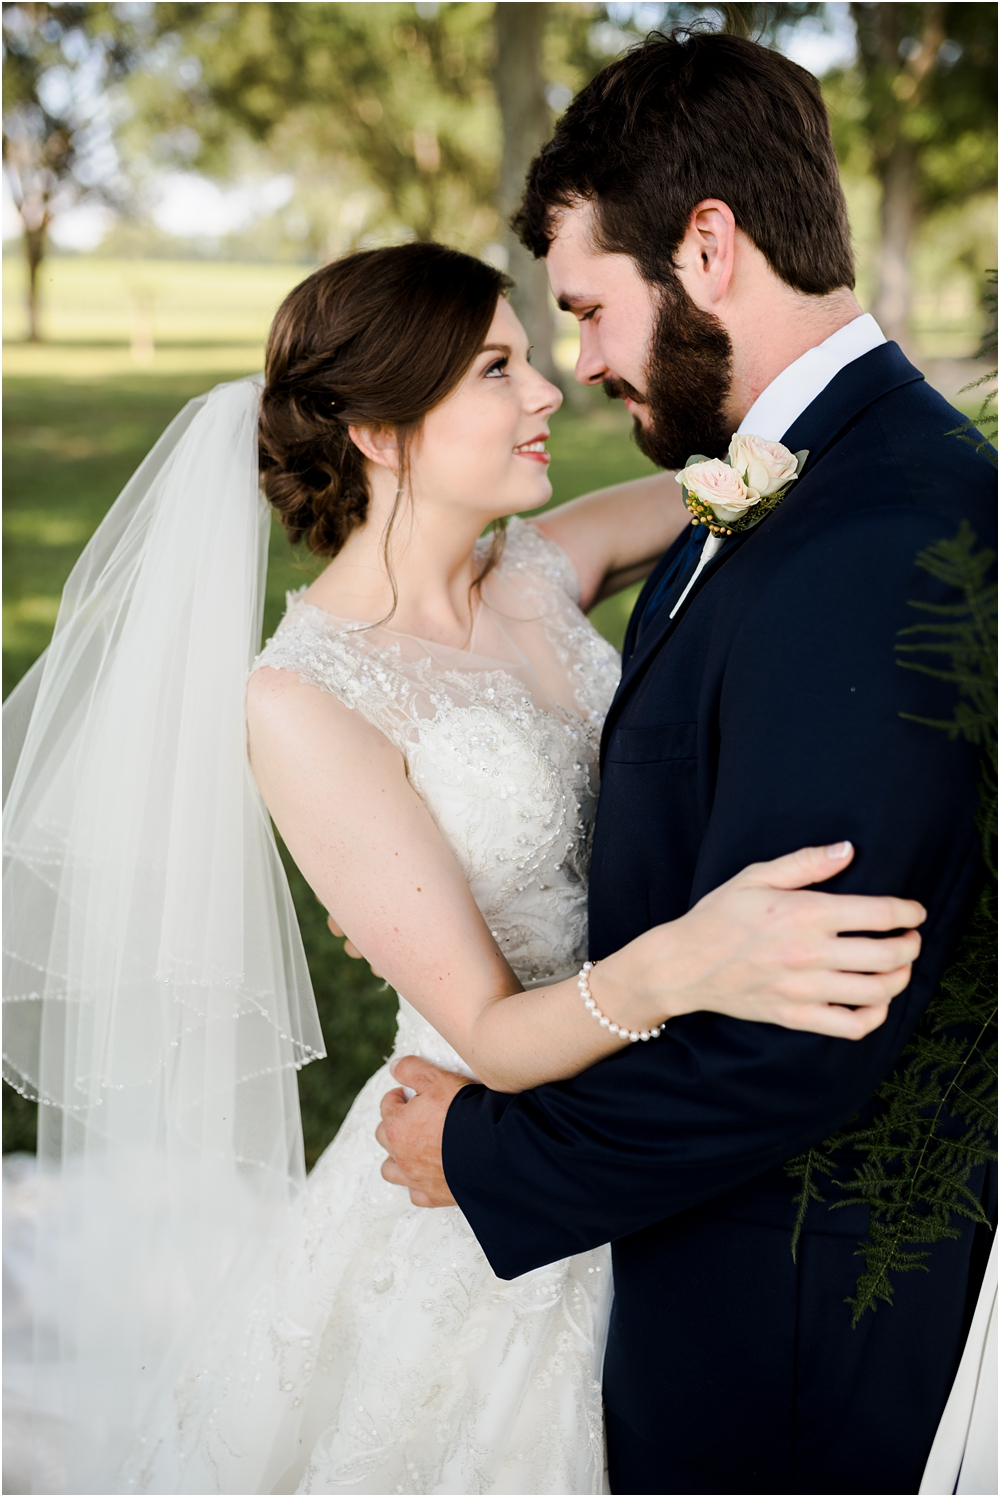 marianna-florida-wedding-photographer-kiersten-grant-73.jpg